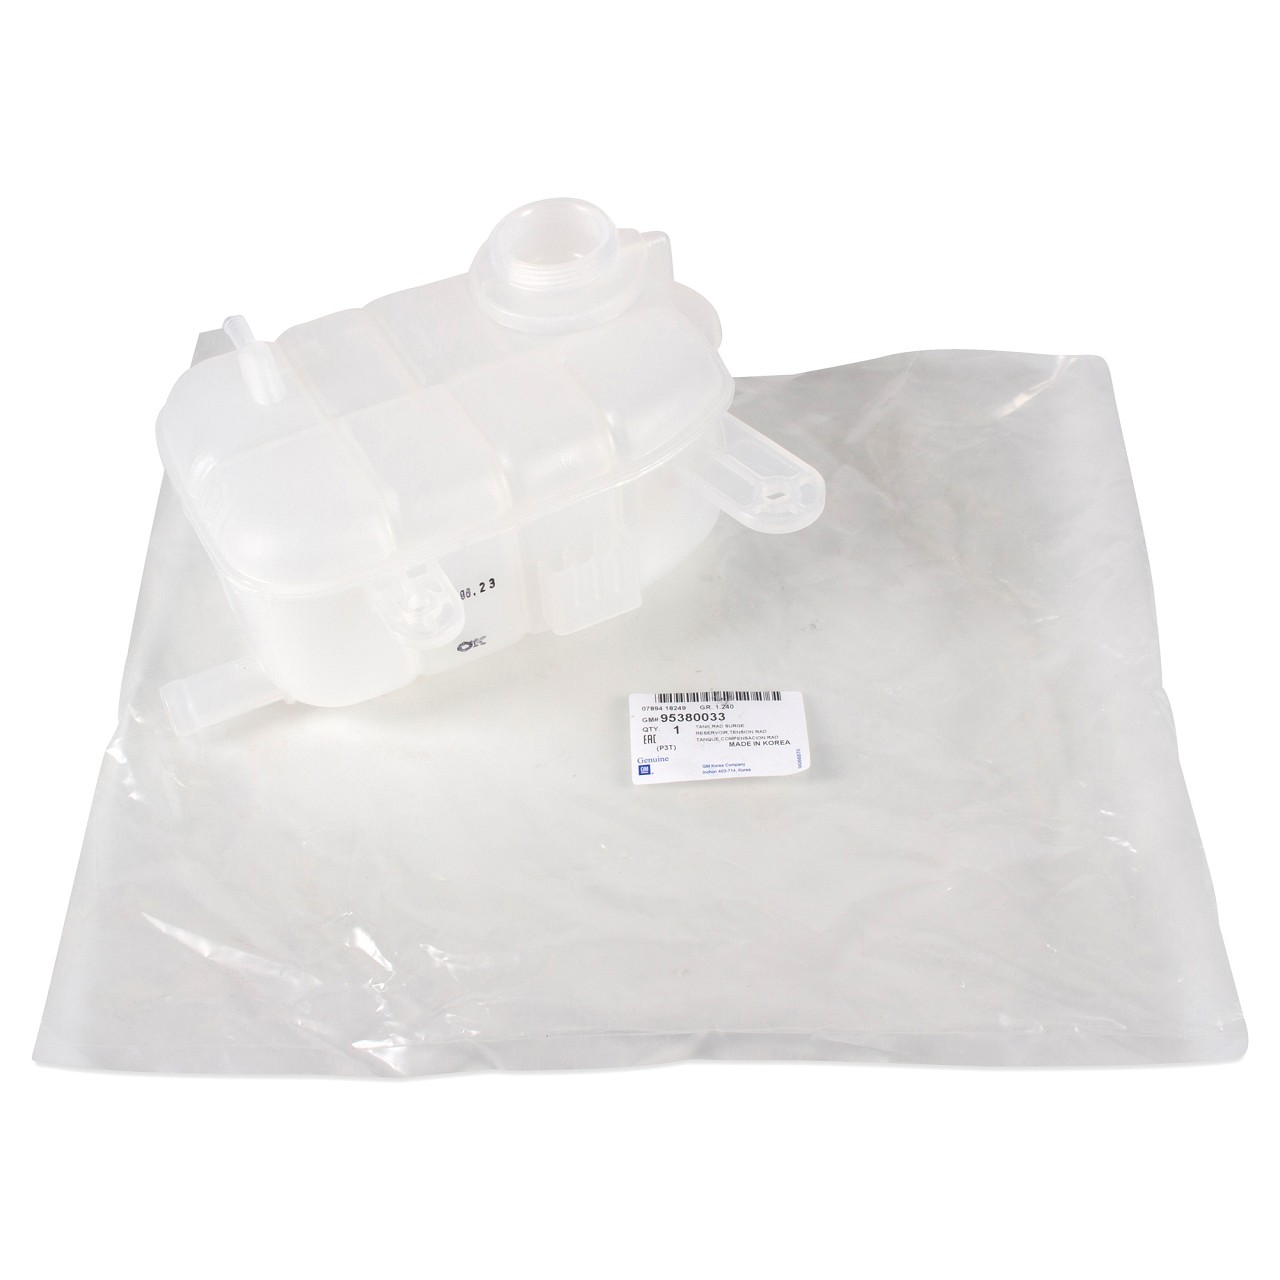 ORIGINAL GM Opel Ausgleichsbehälter Kühlmittelbehälter MOKKA (J13) 95380033